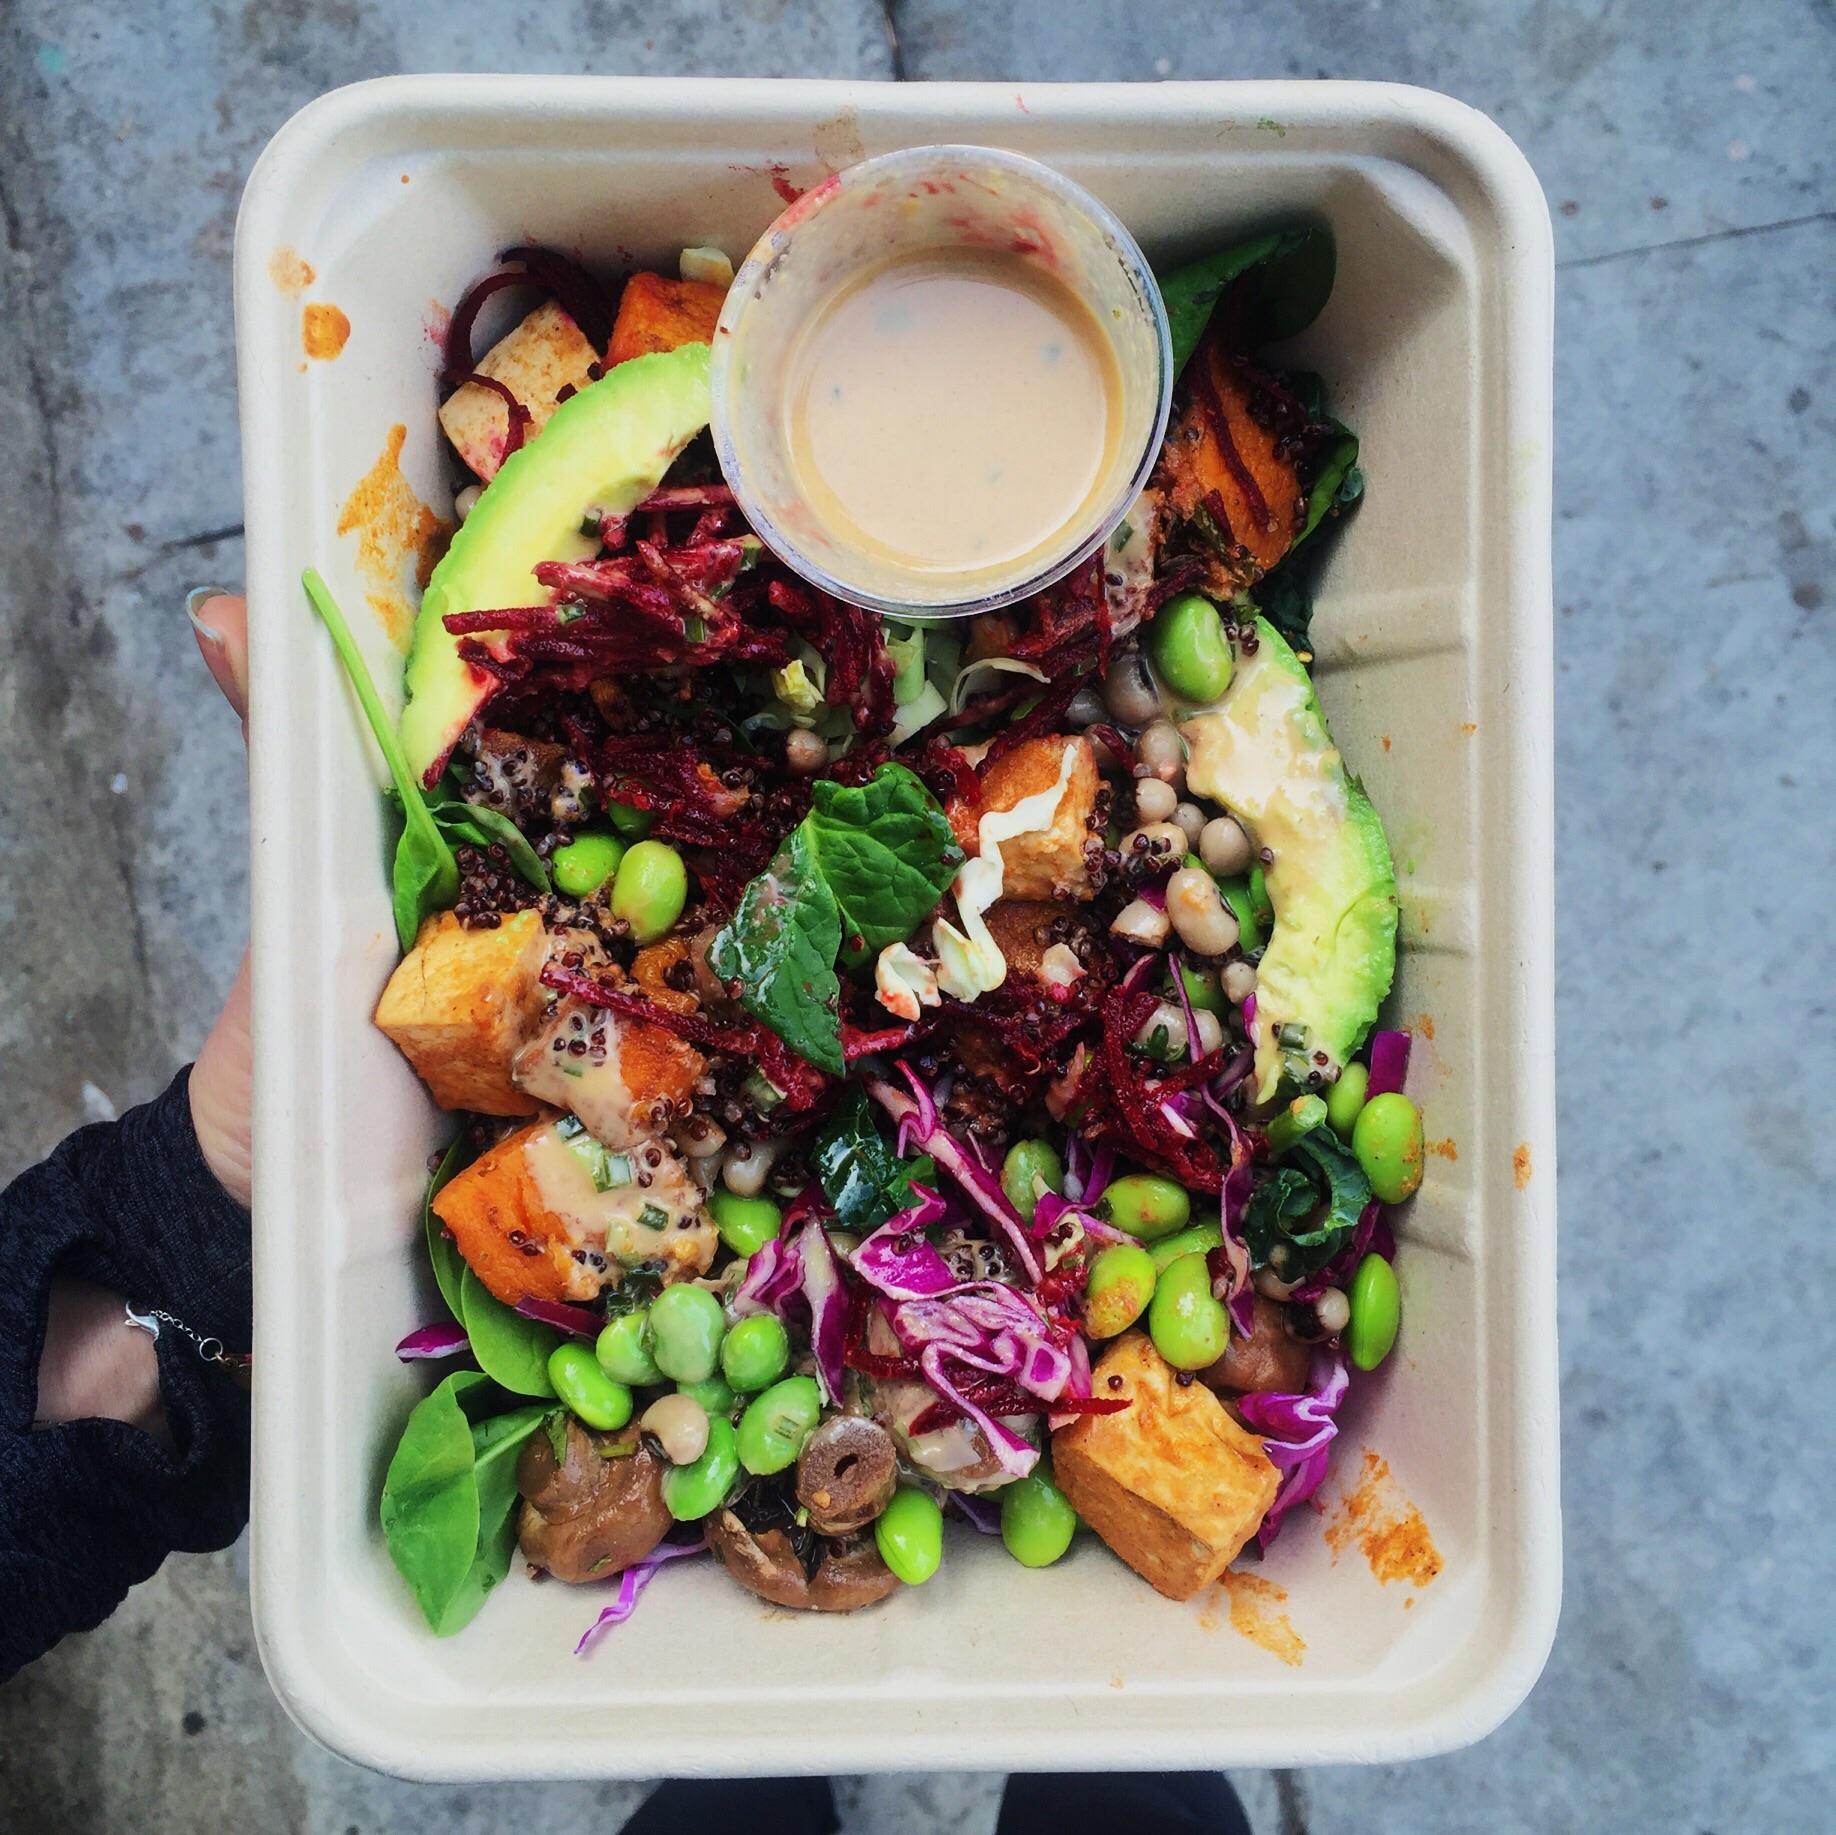 Lee vs. The Whole Foods Salad bar, part 4